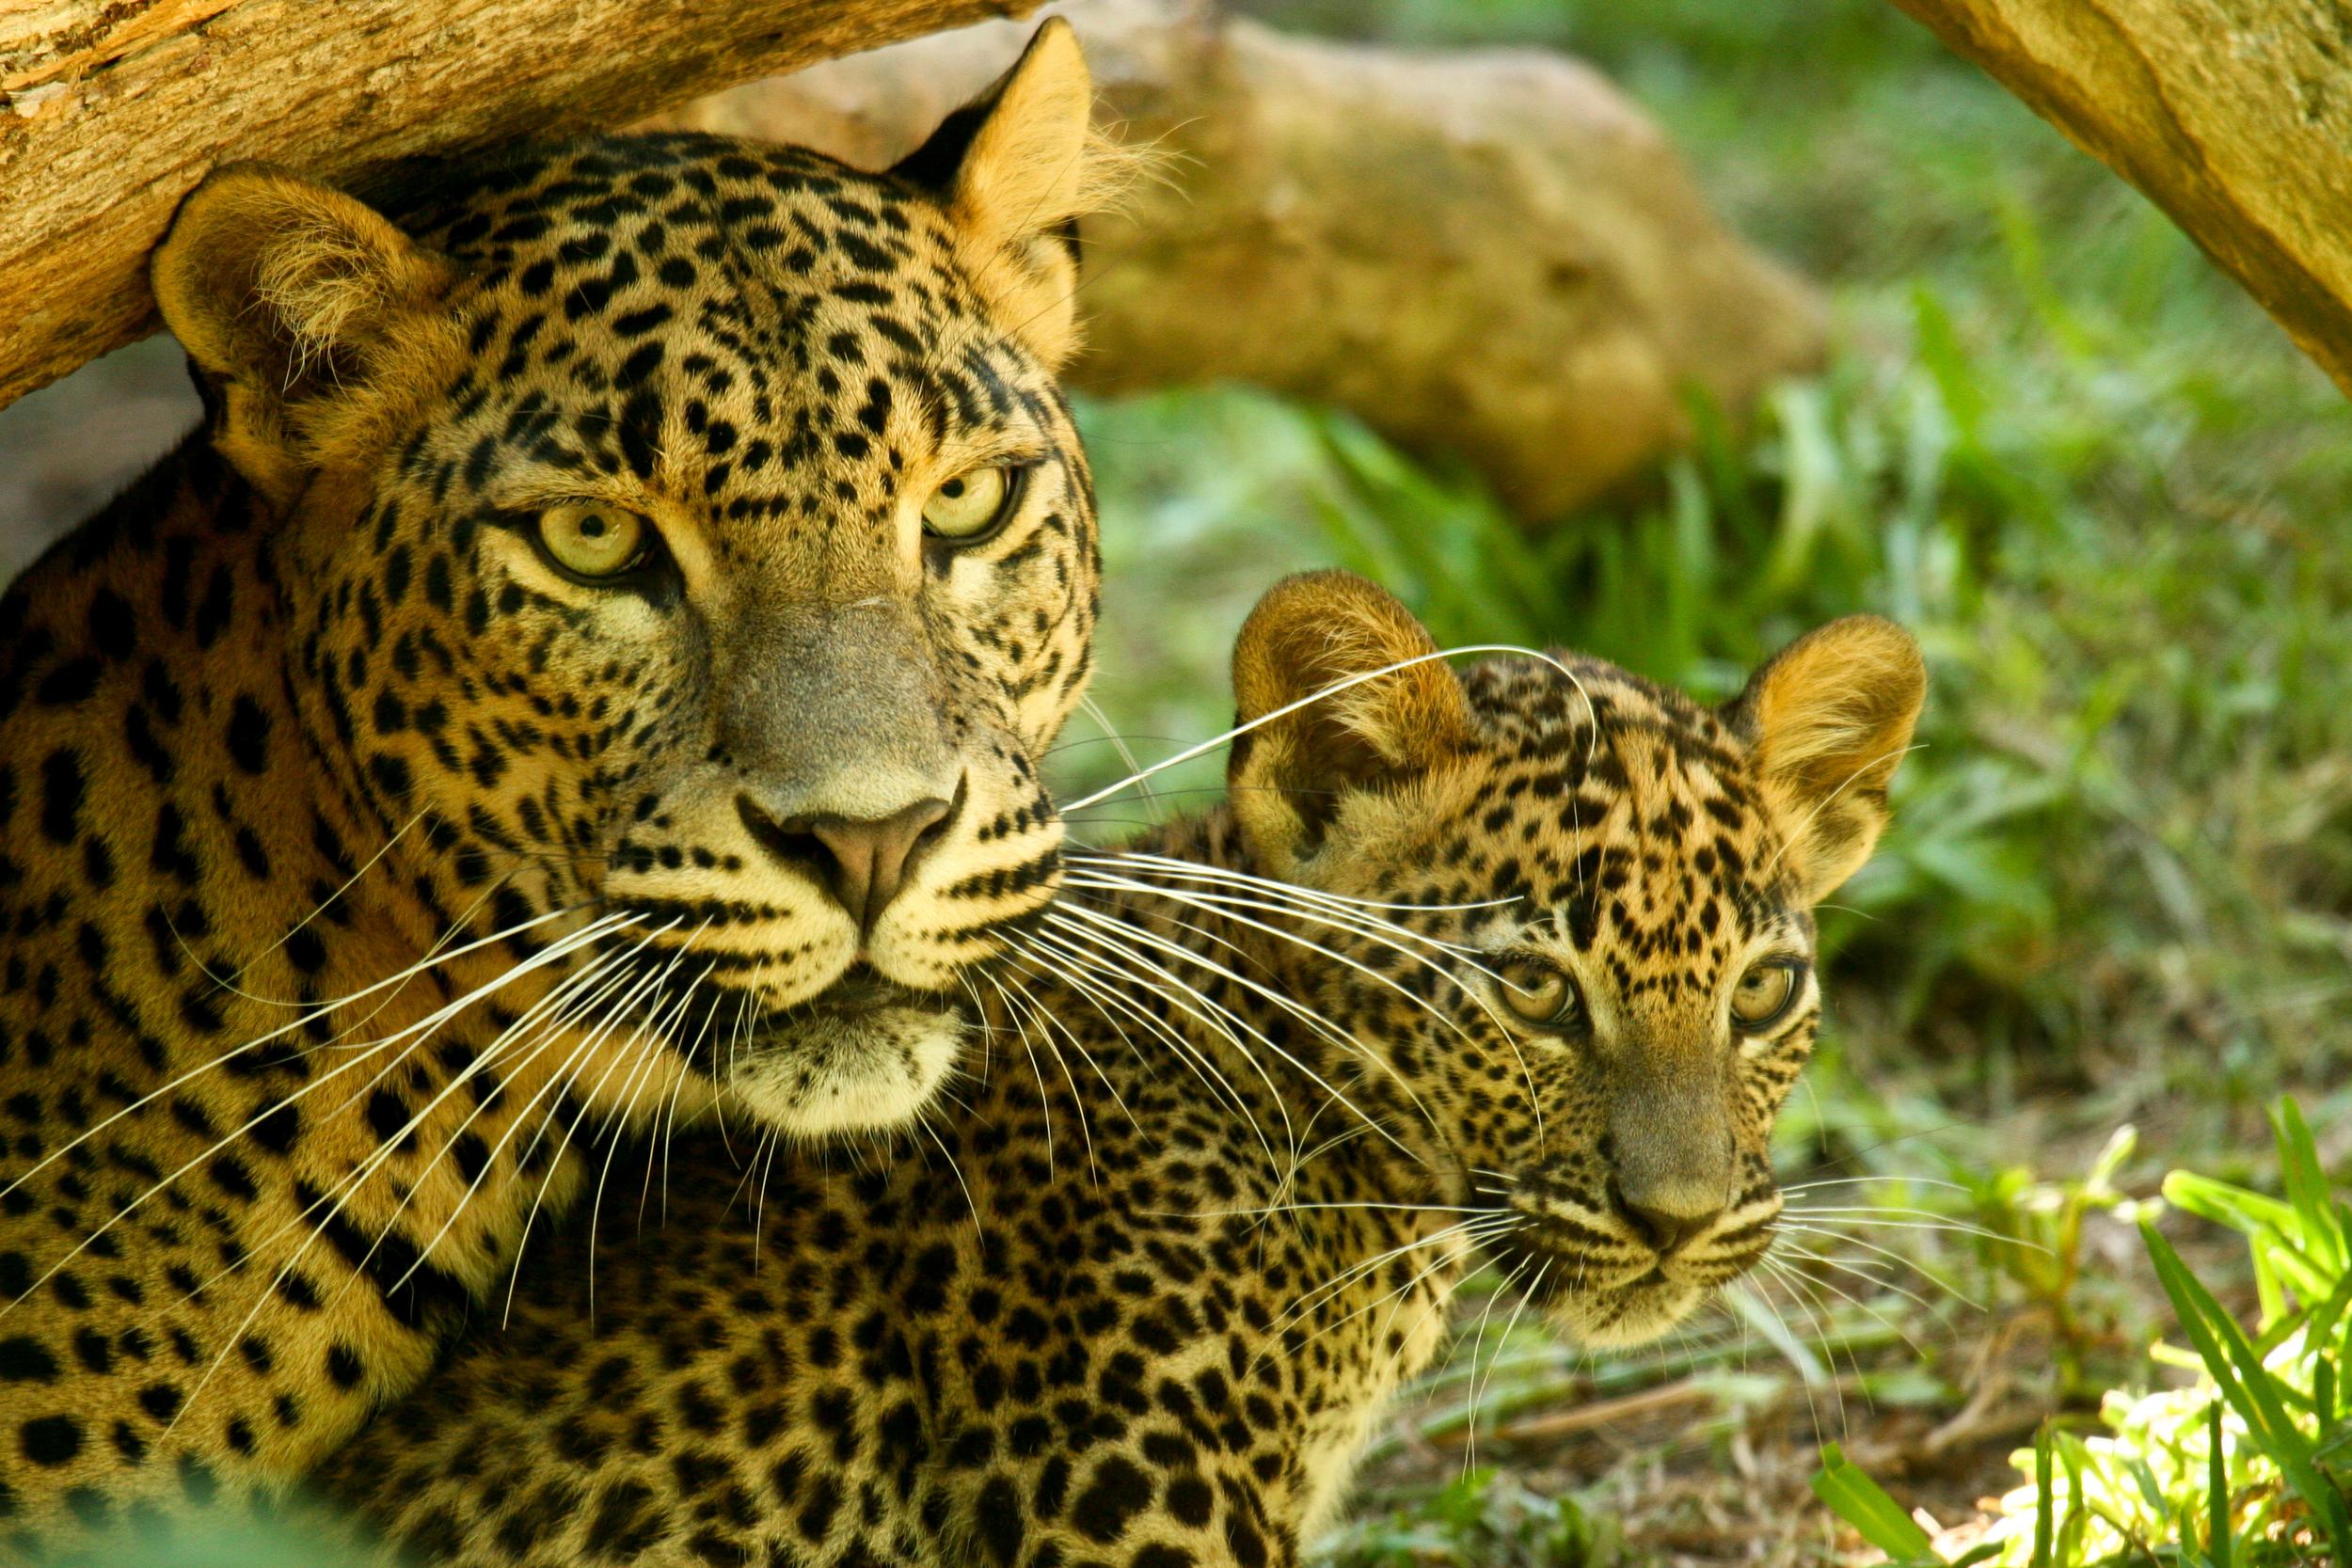 invite-to-paradise-sri-lanka-honeymoon-holiday-wildlife-leopard-safari-3.jpg